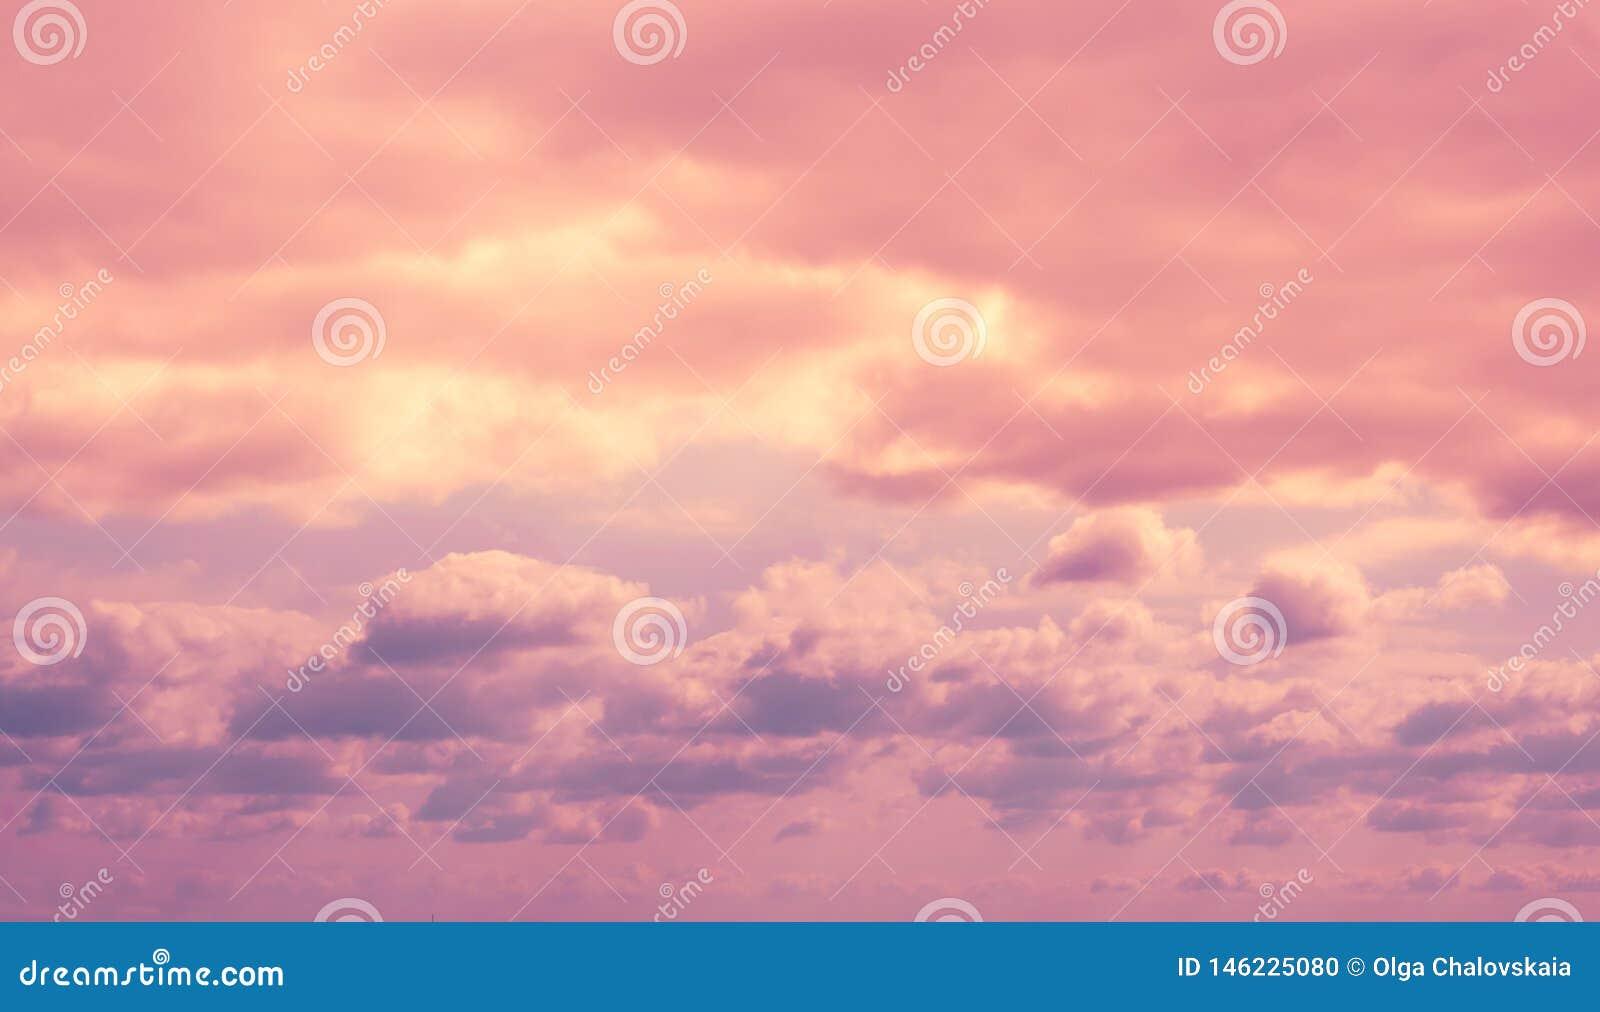 Kleurrijke dramatische lilac hemel en ultraviolette wolken